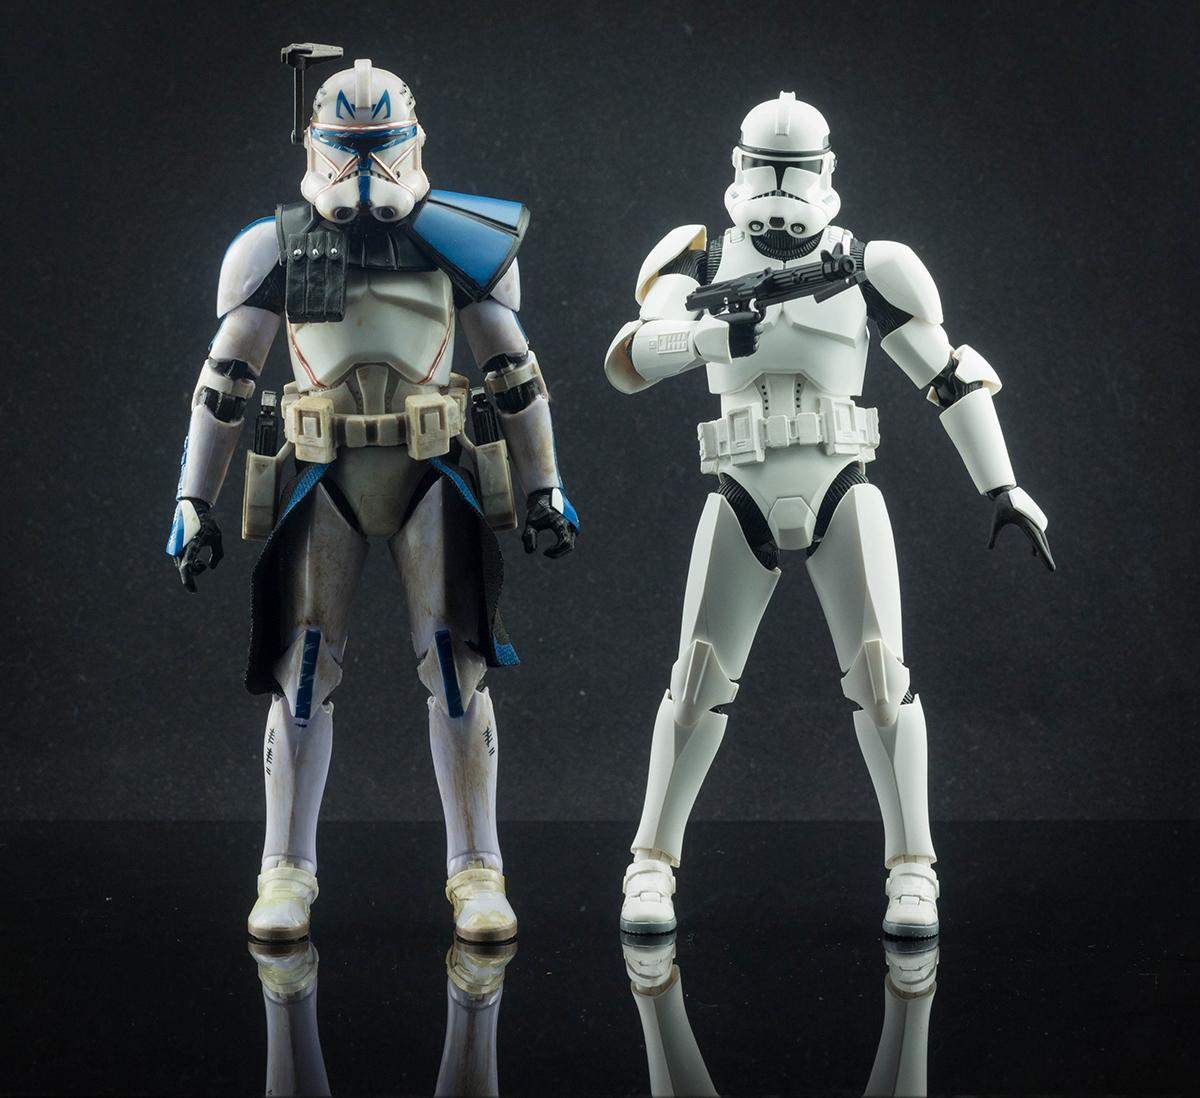 Figuarts Clone Trooper Phase Ii Vs Clone Captain Rex Toys